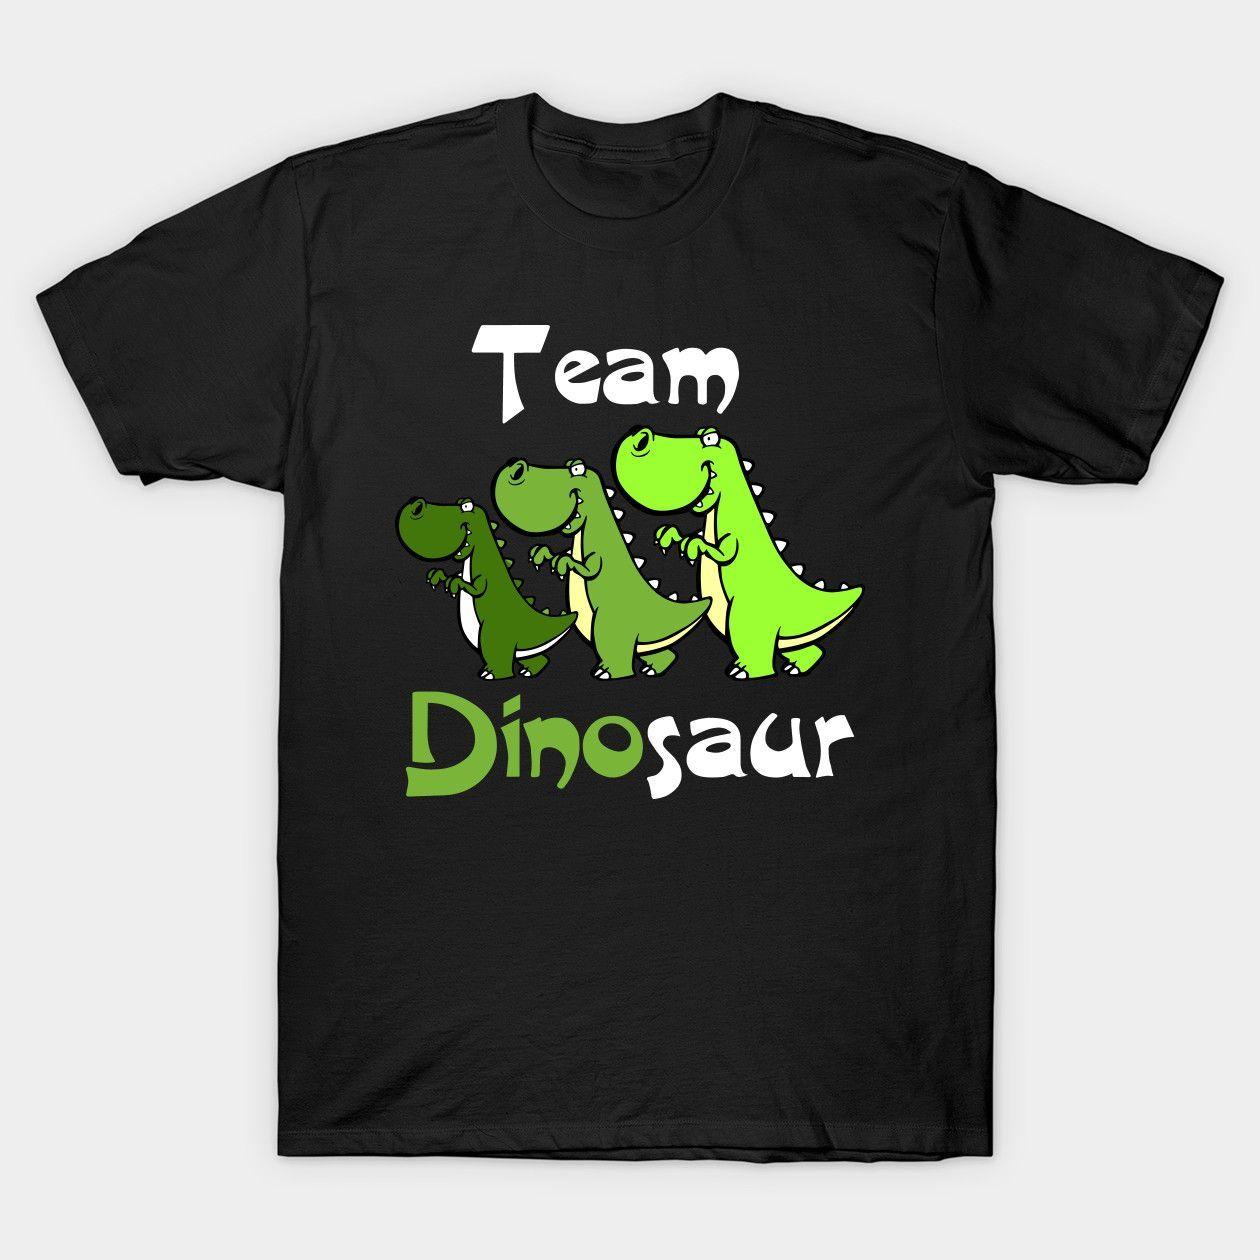 Dinosaur, Dinosaur lover, T rex, prehistoric, Dino, Prehistoric creature, Tyrannosaurus Rex, Trex, tyrannosaur, Animal, Dinosaur lover, t rex, dinosa #prehistoriccreatures Dinosaur, Dinosaur lover, T rex, prehistoric, Dino, Prehistoric creature, Tyrannosaurus Rex, Trex, tyrannosaur, Animal, Dinosaur lover, t rex, dinosa #tyrannosaurusrex